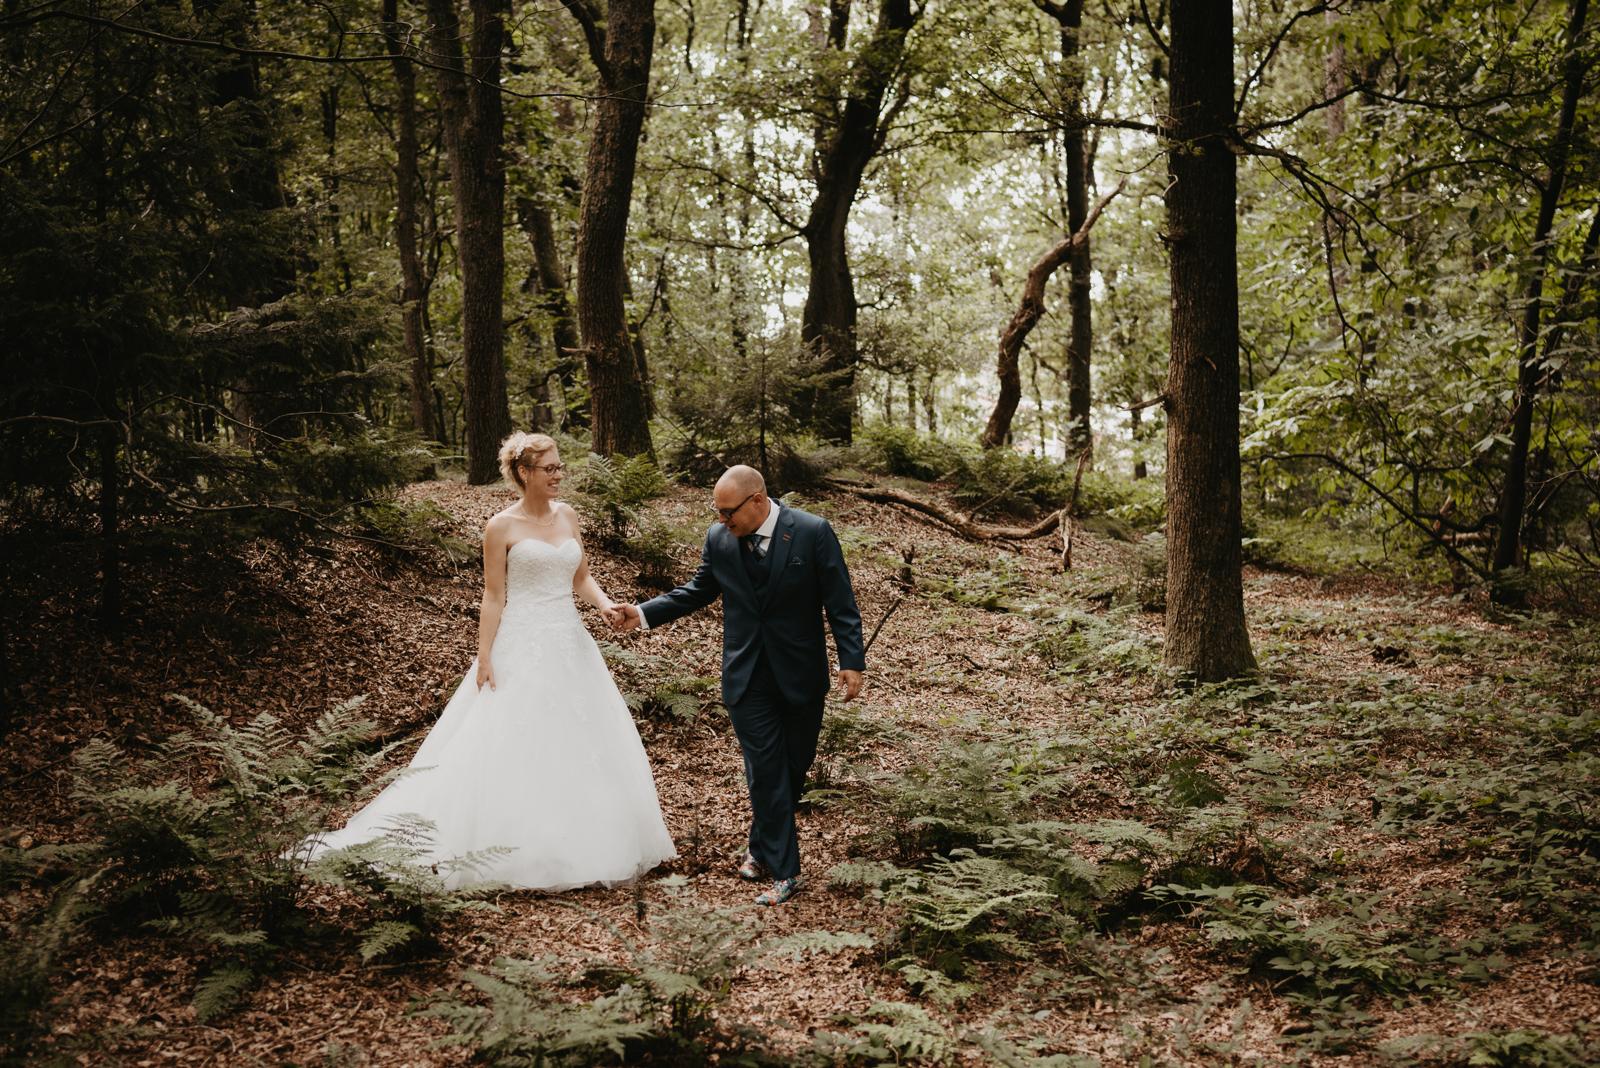 bruiloft-de-warrel-westerbork-drenthe